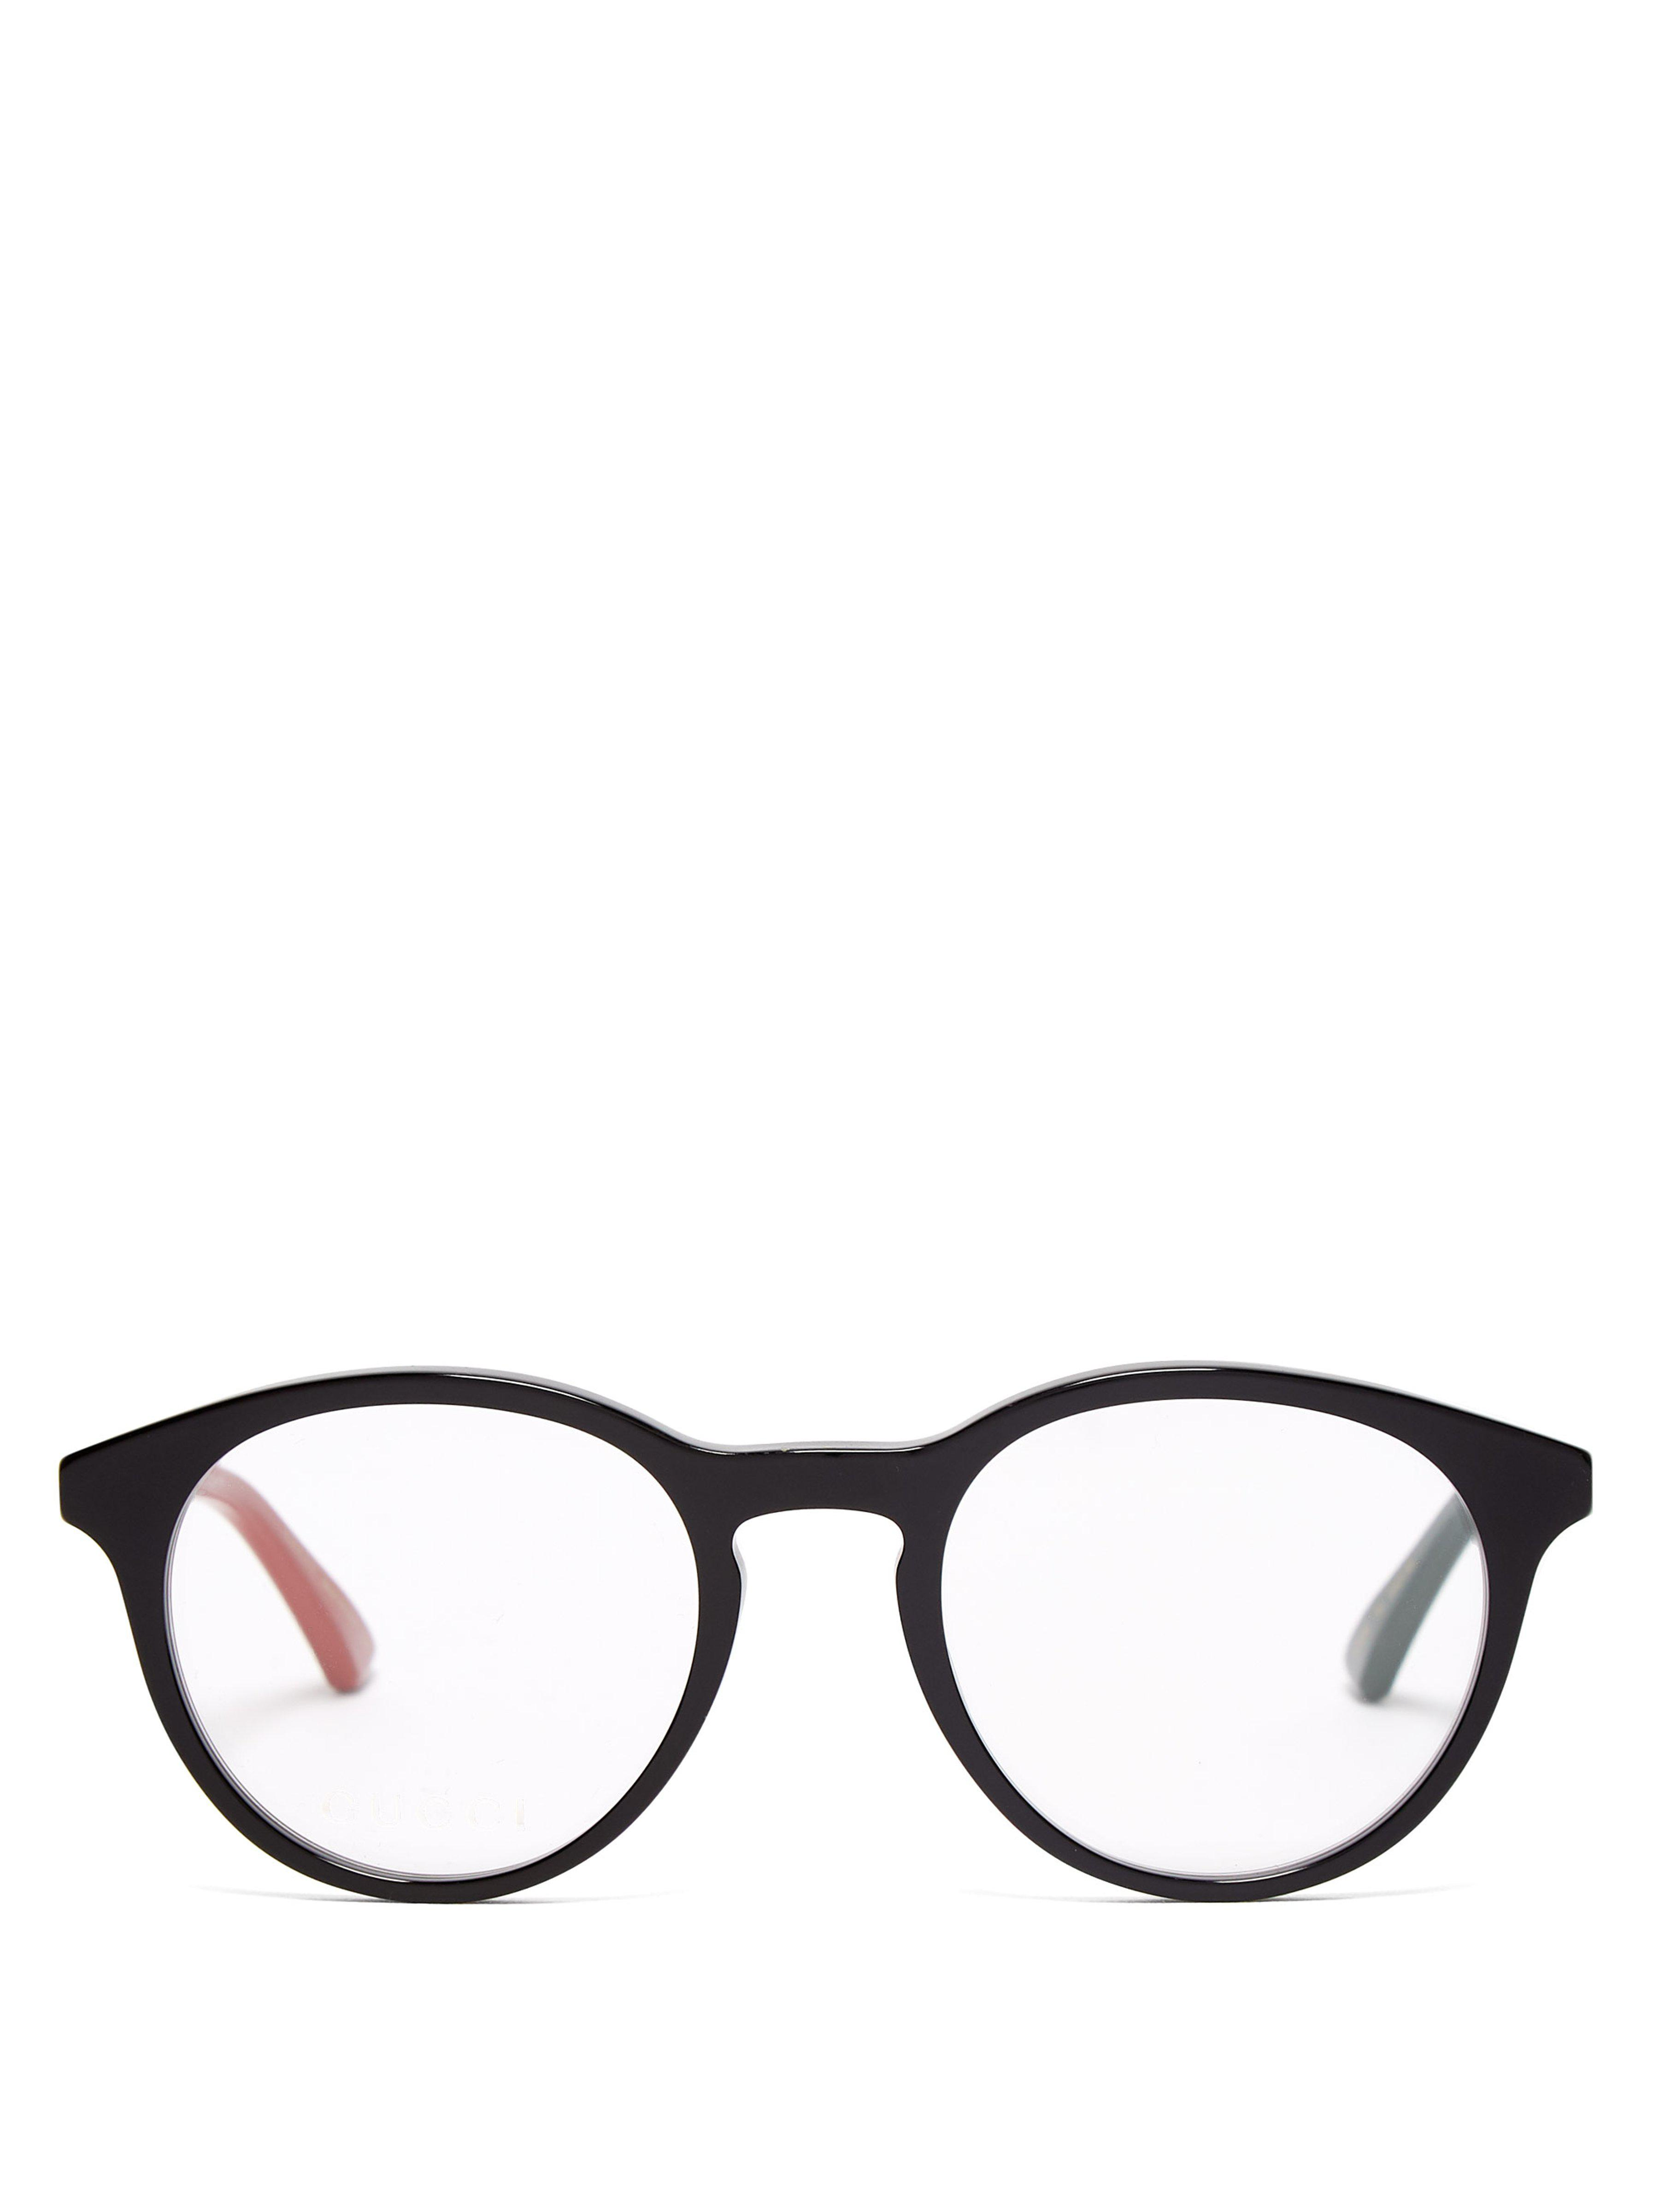 8ceda54171 Gucci Round Frame Acetate Glasses in Black for Men - Lyst